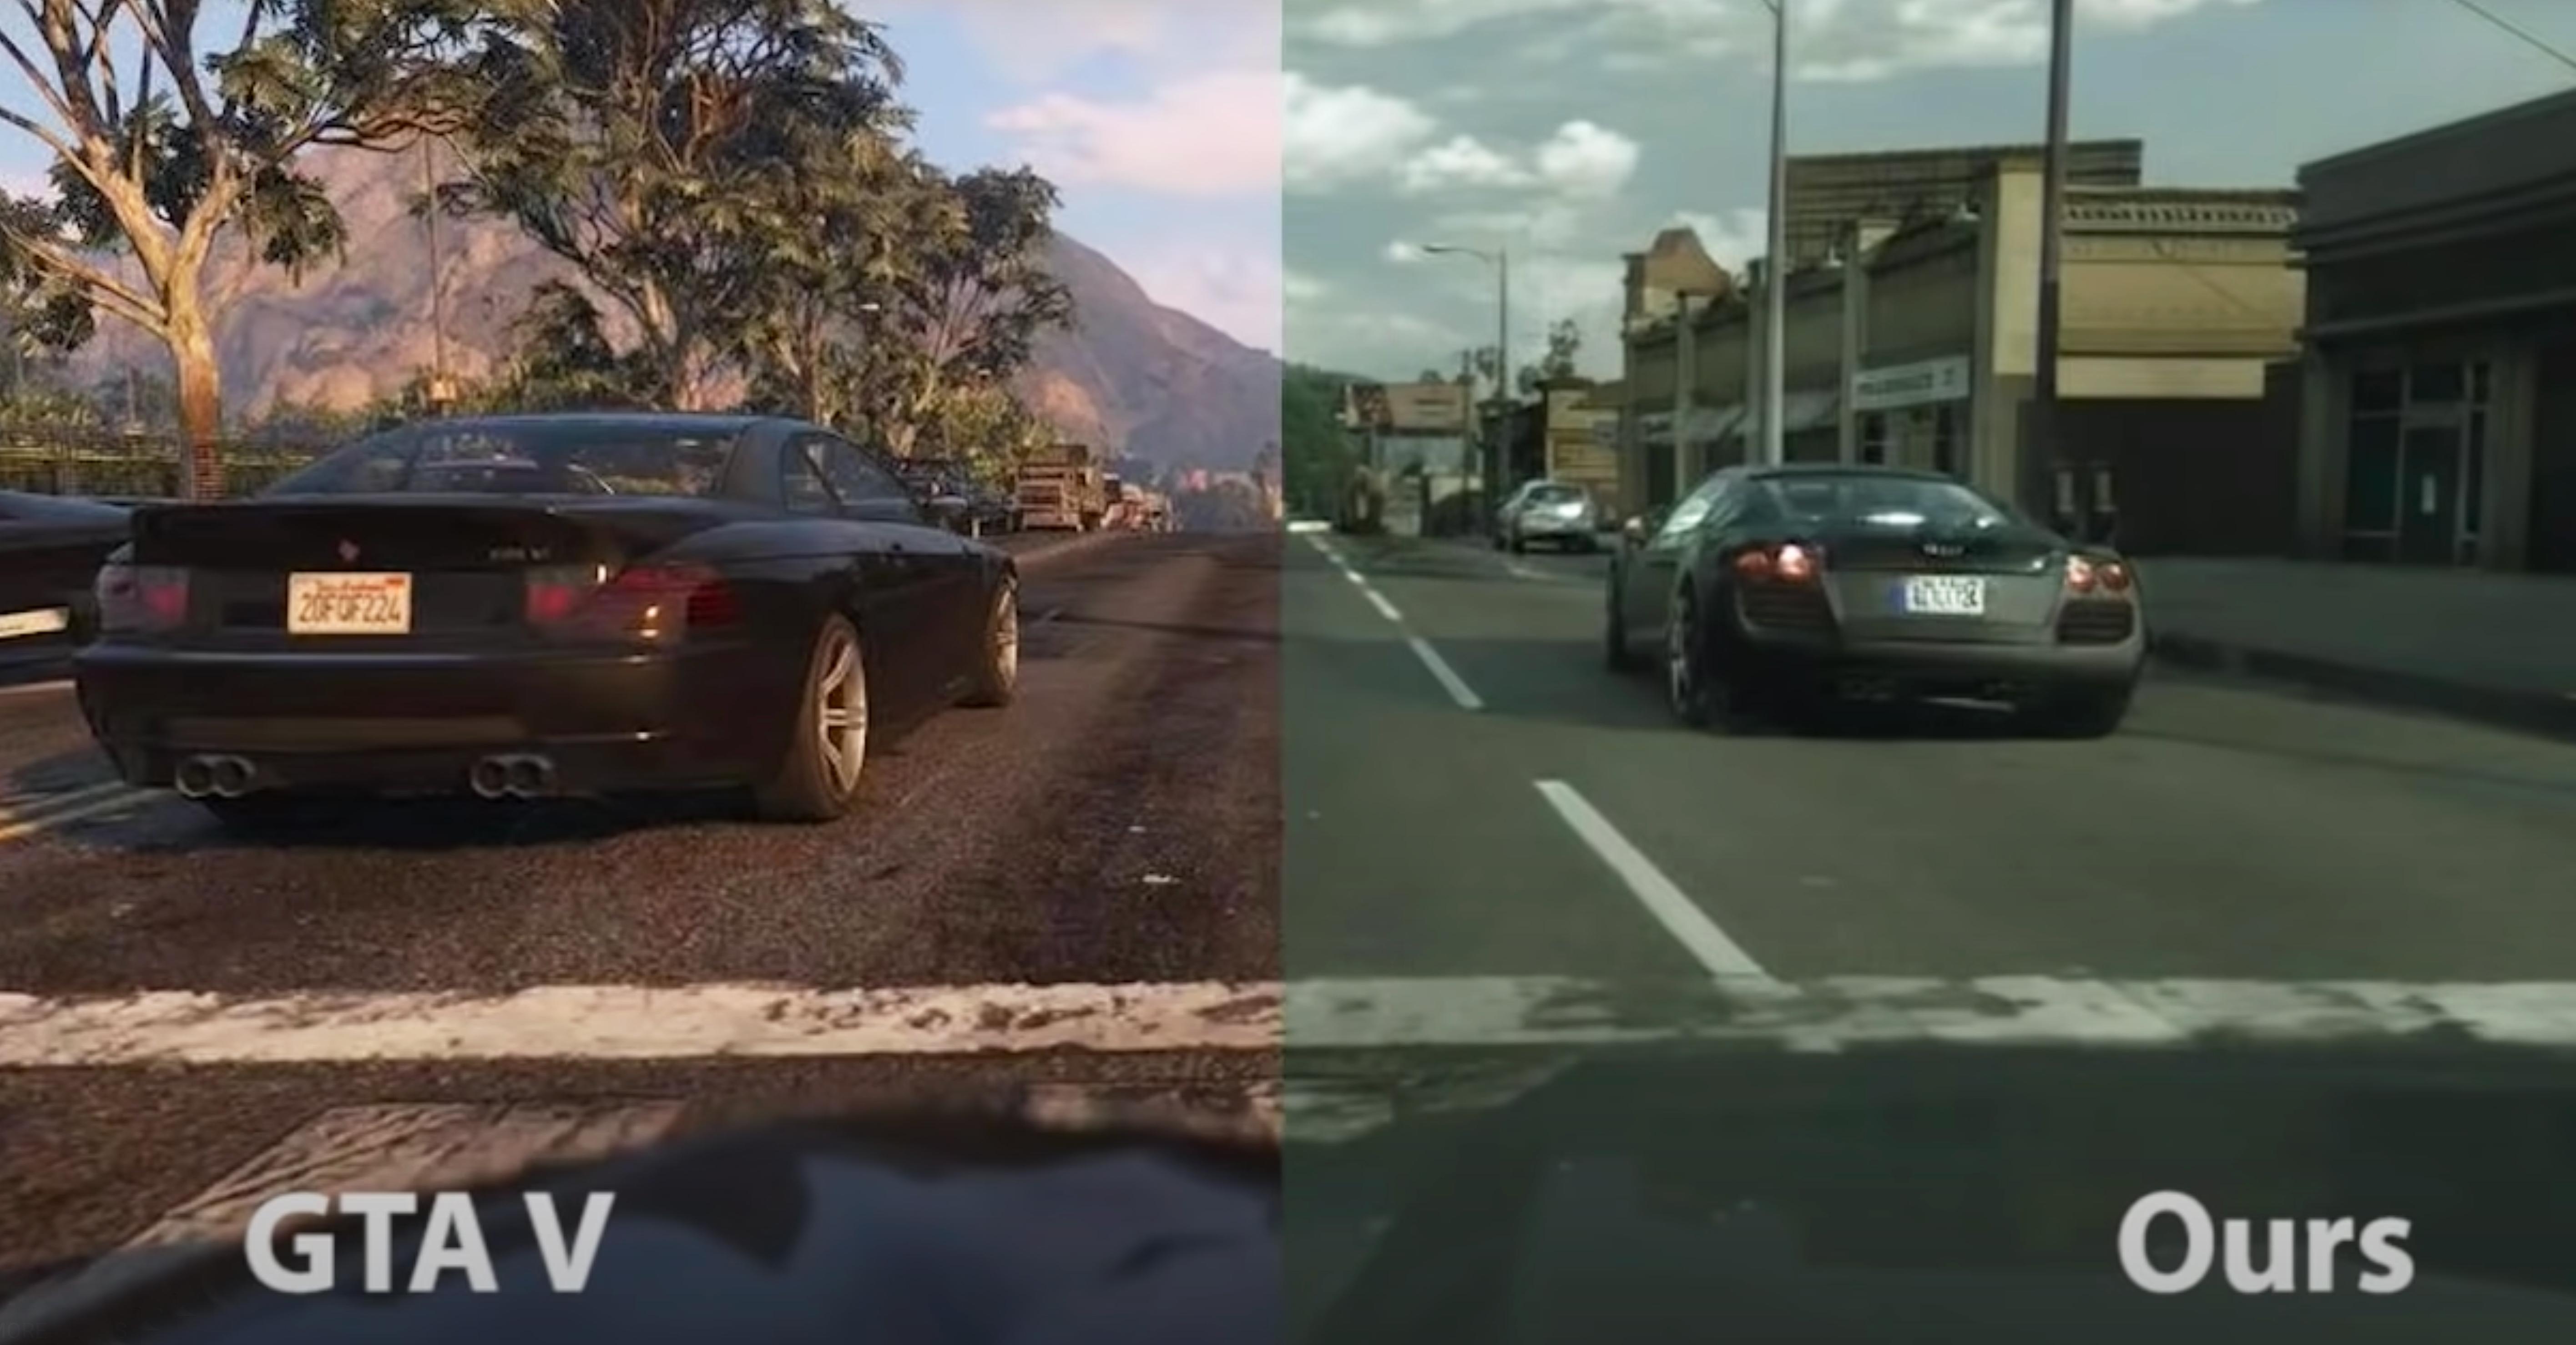 'Grand Theft Auto V' mod adds uncanny photorealism through AI   Engadget